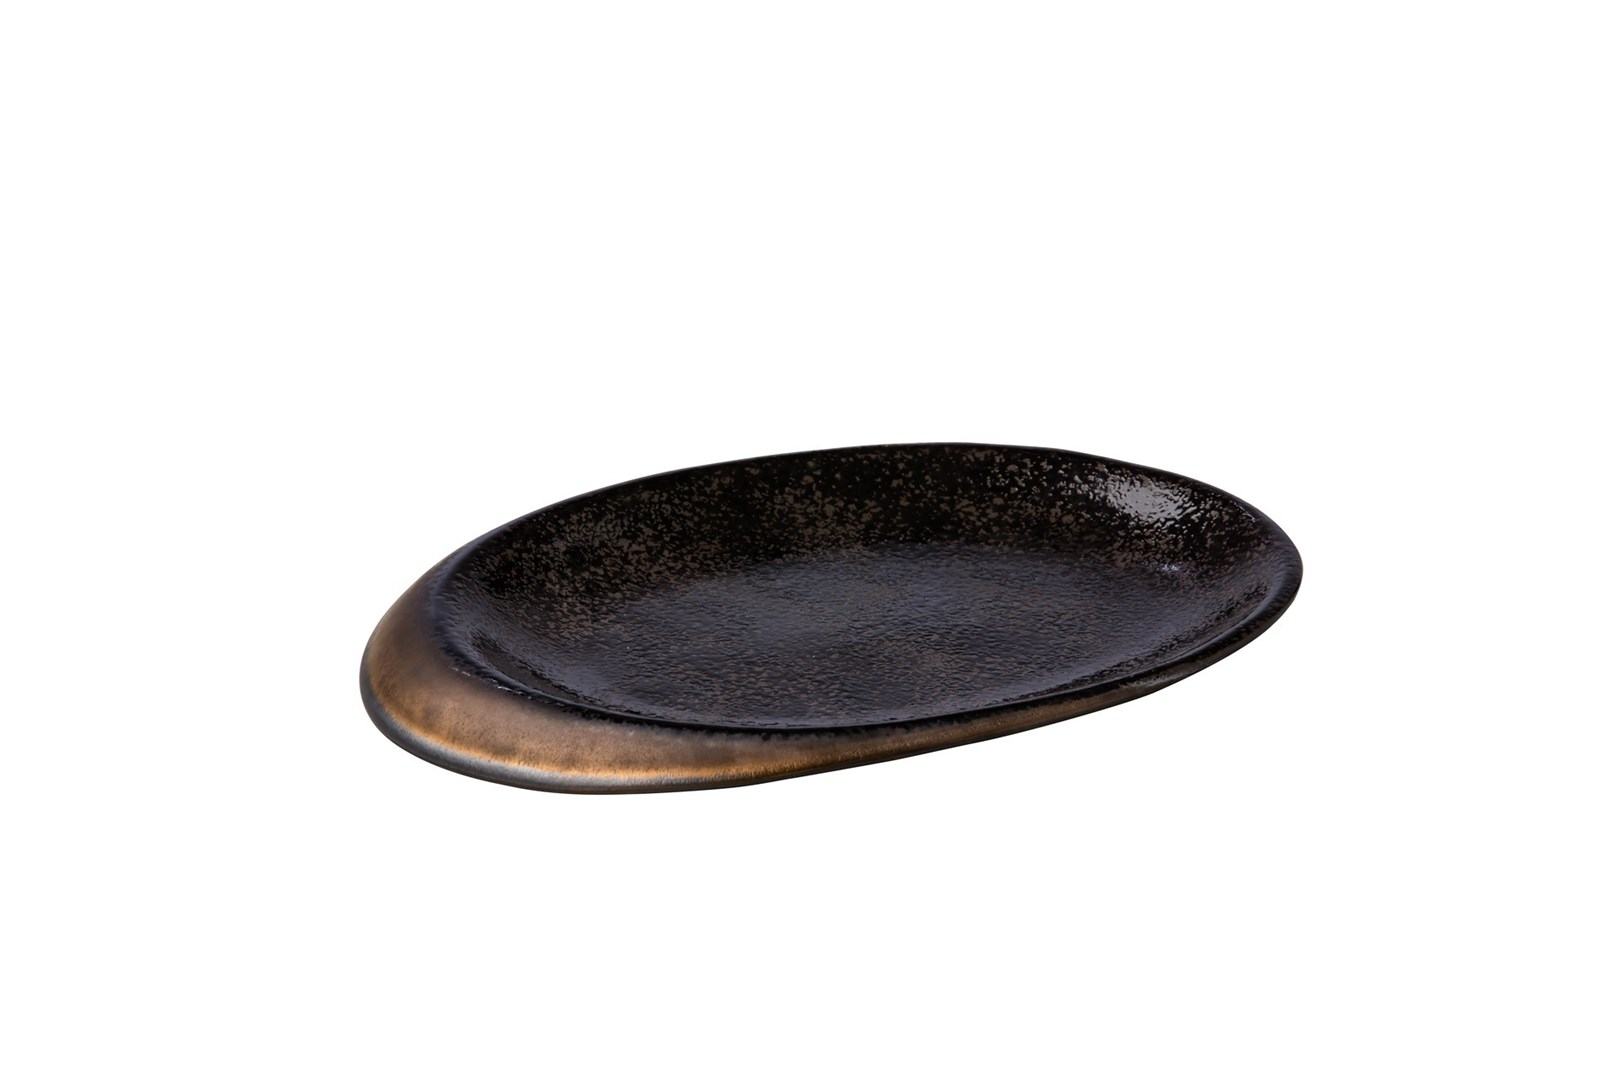 Productafbeelding Ovaal bord stone zwart/goud 25,8 x 18,5 x 2 cm